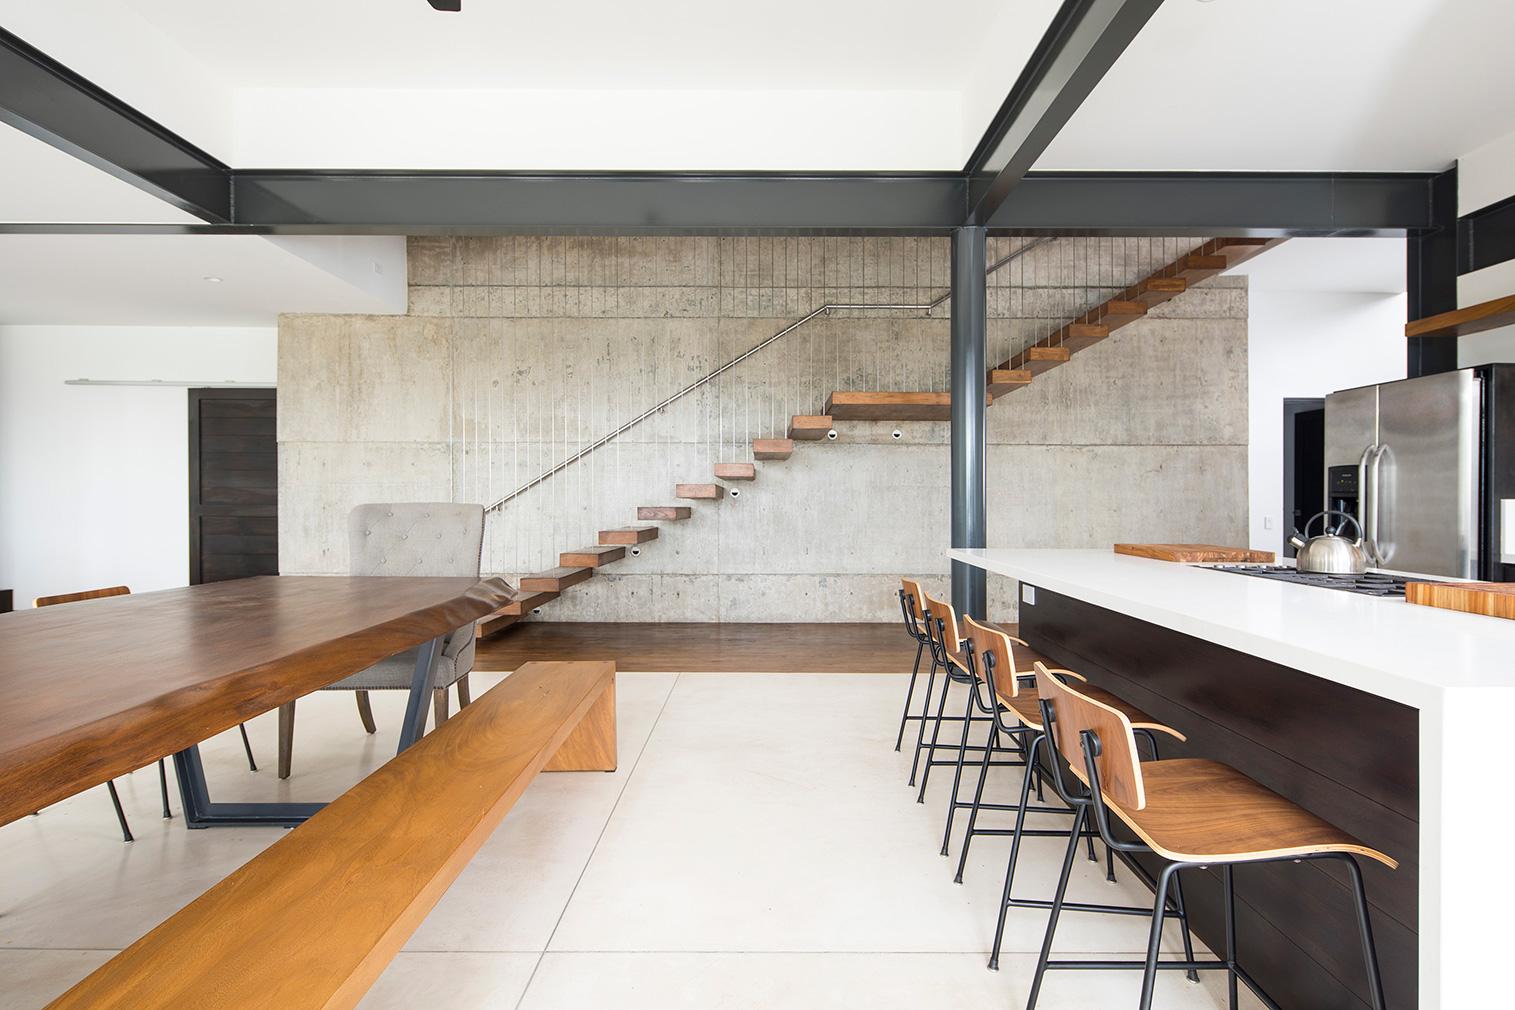 Casa Maleku designed by Studio Saxe for Joya Villas